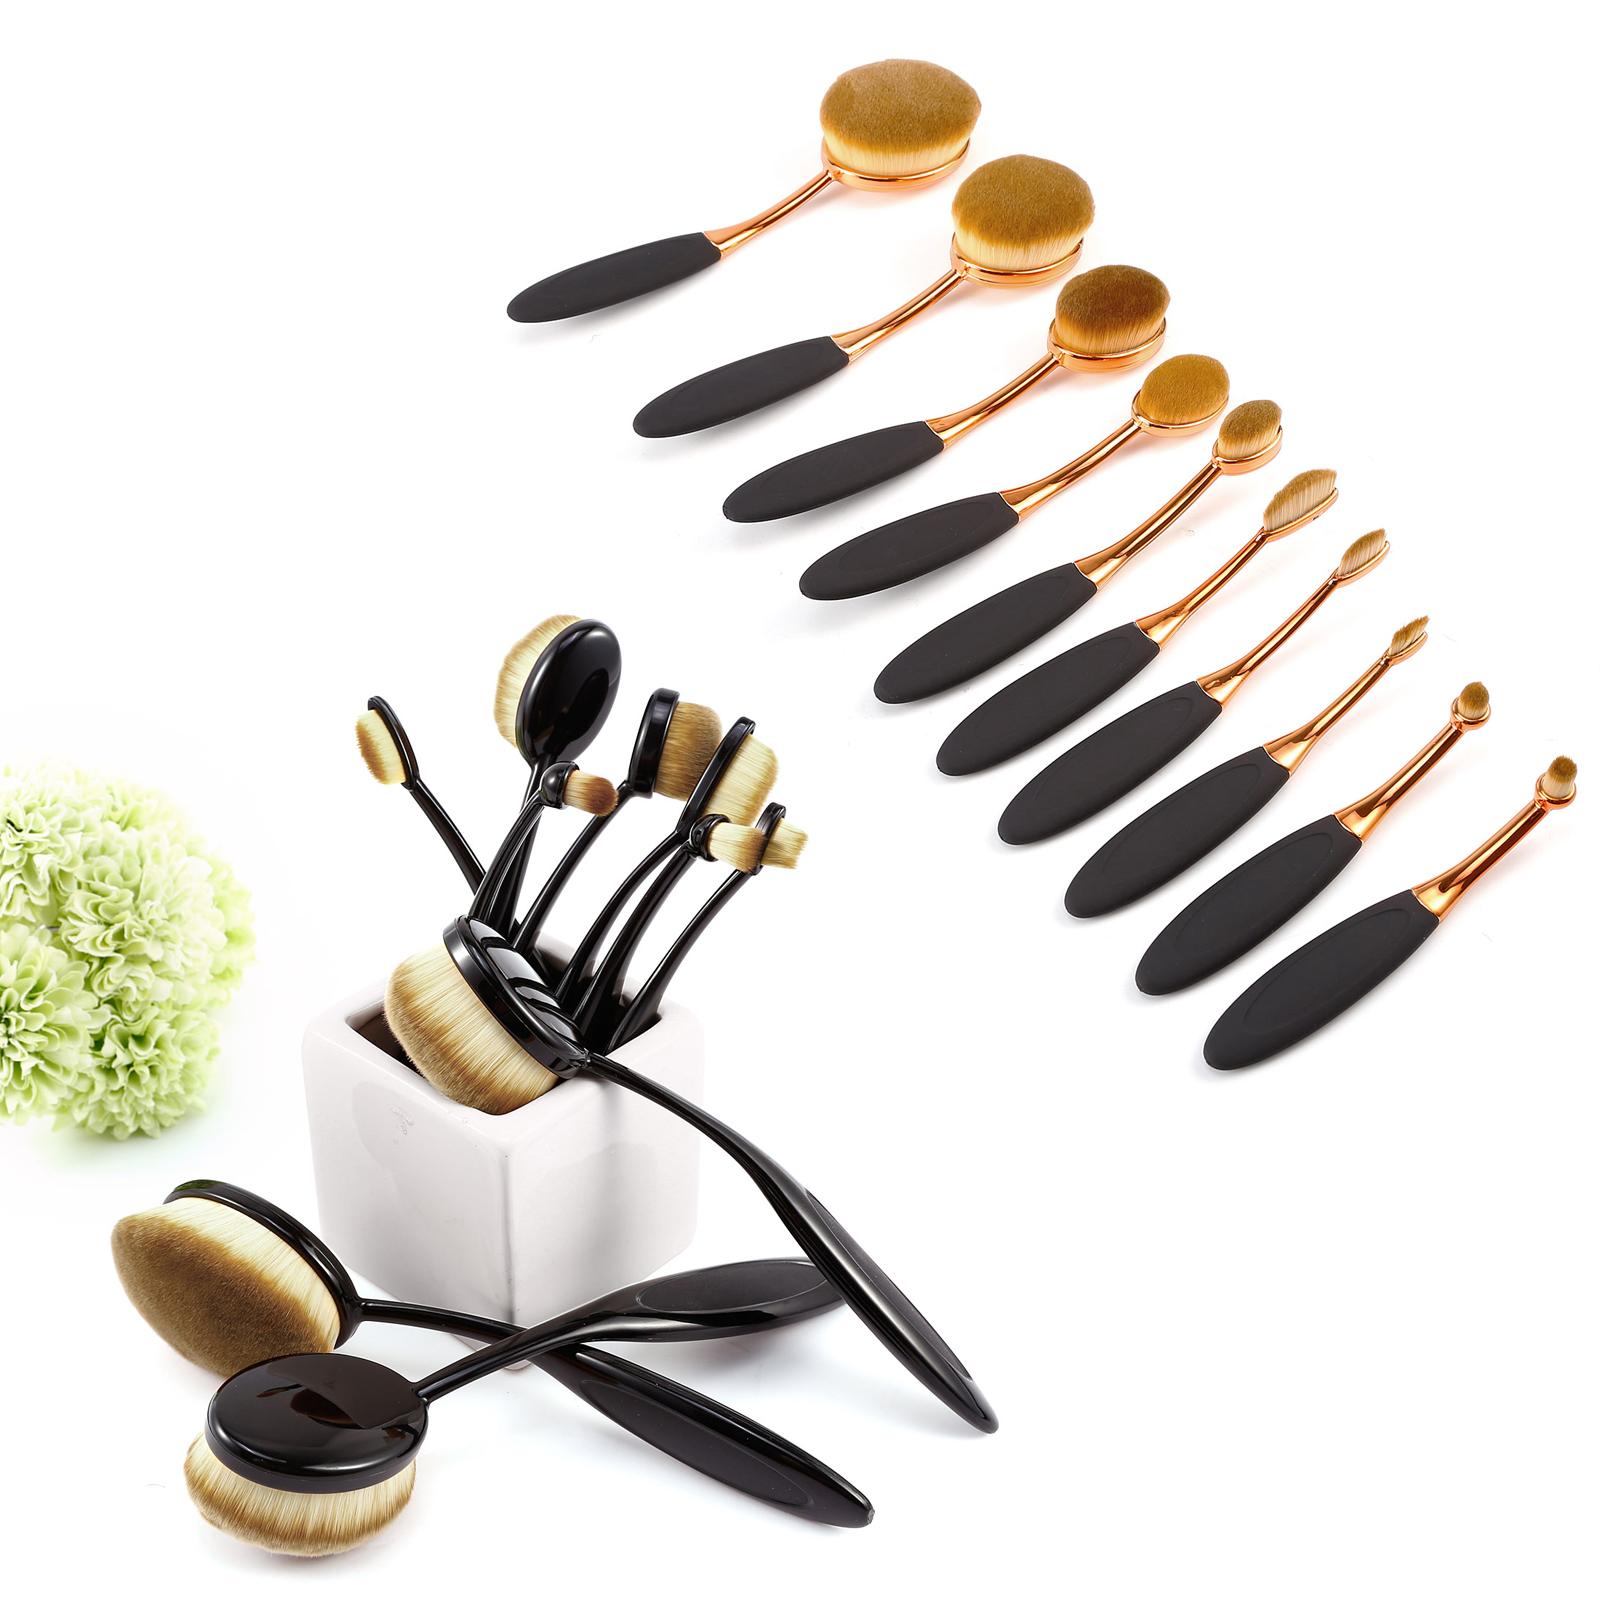 fr ulein 38 foundation pinsel make up pinsel schminkpinsel. Black Bedroom Furniture Sets. Home Design Ideas